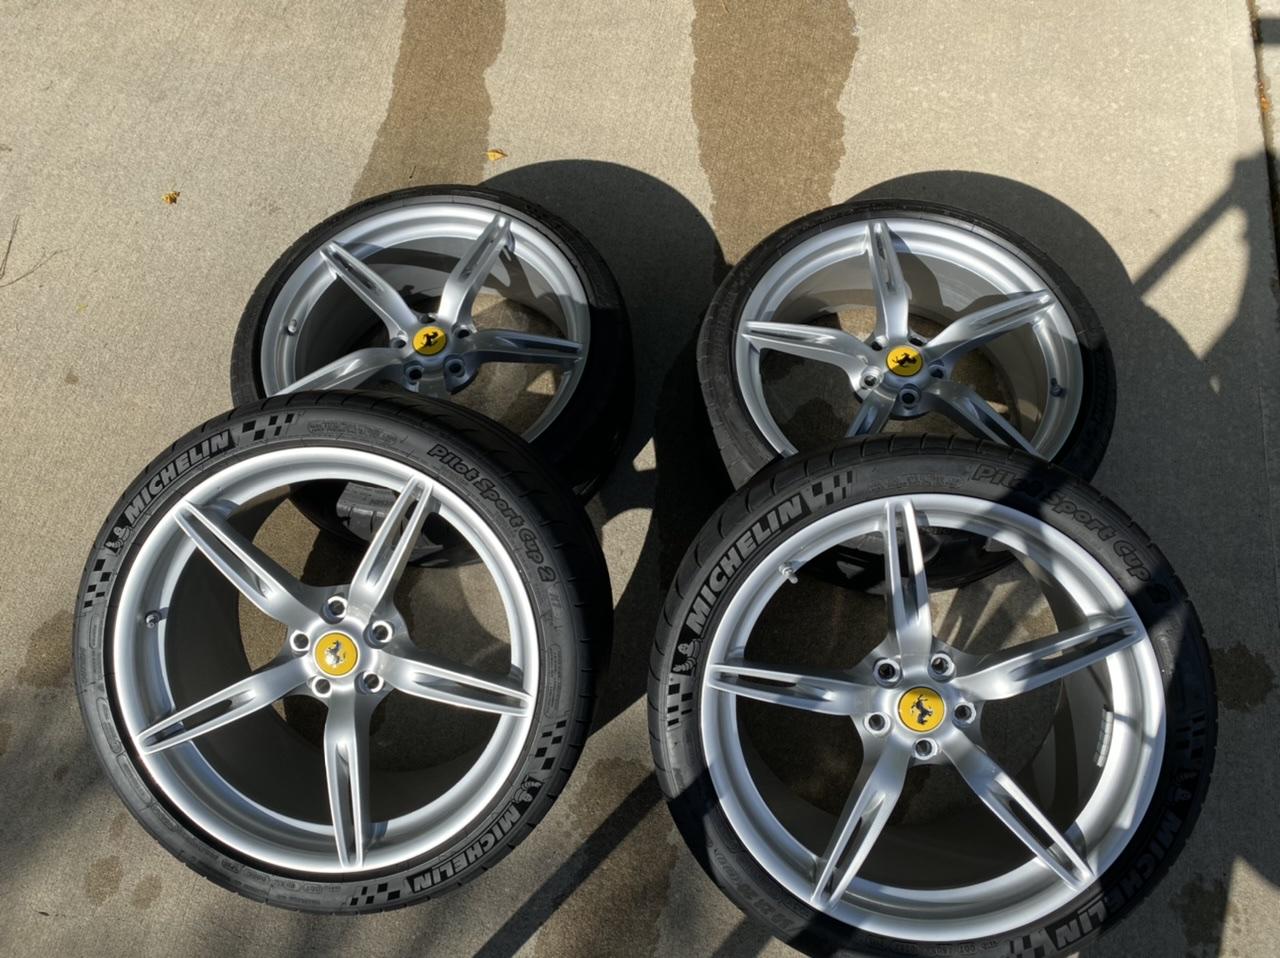 For Sale 20 Ferrari 458 Speciale Wheels Forged Oem Silver Tpms Valve Stems Caps Tires Ferrarichat